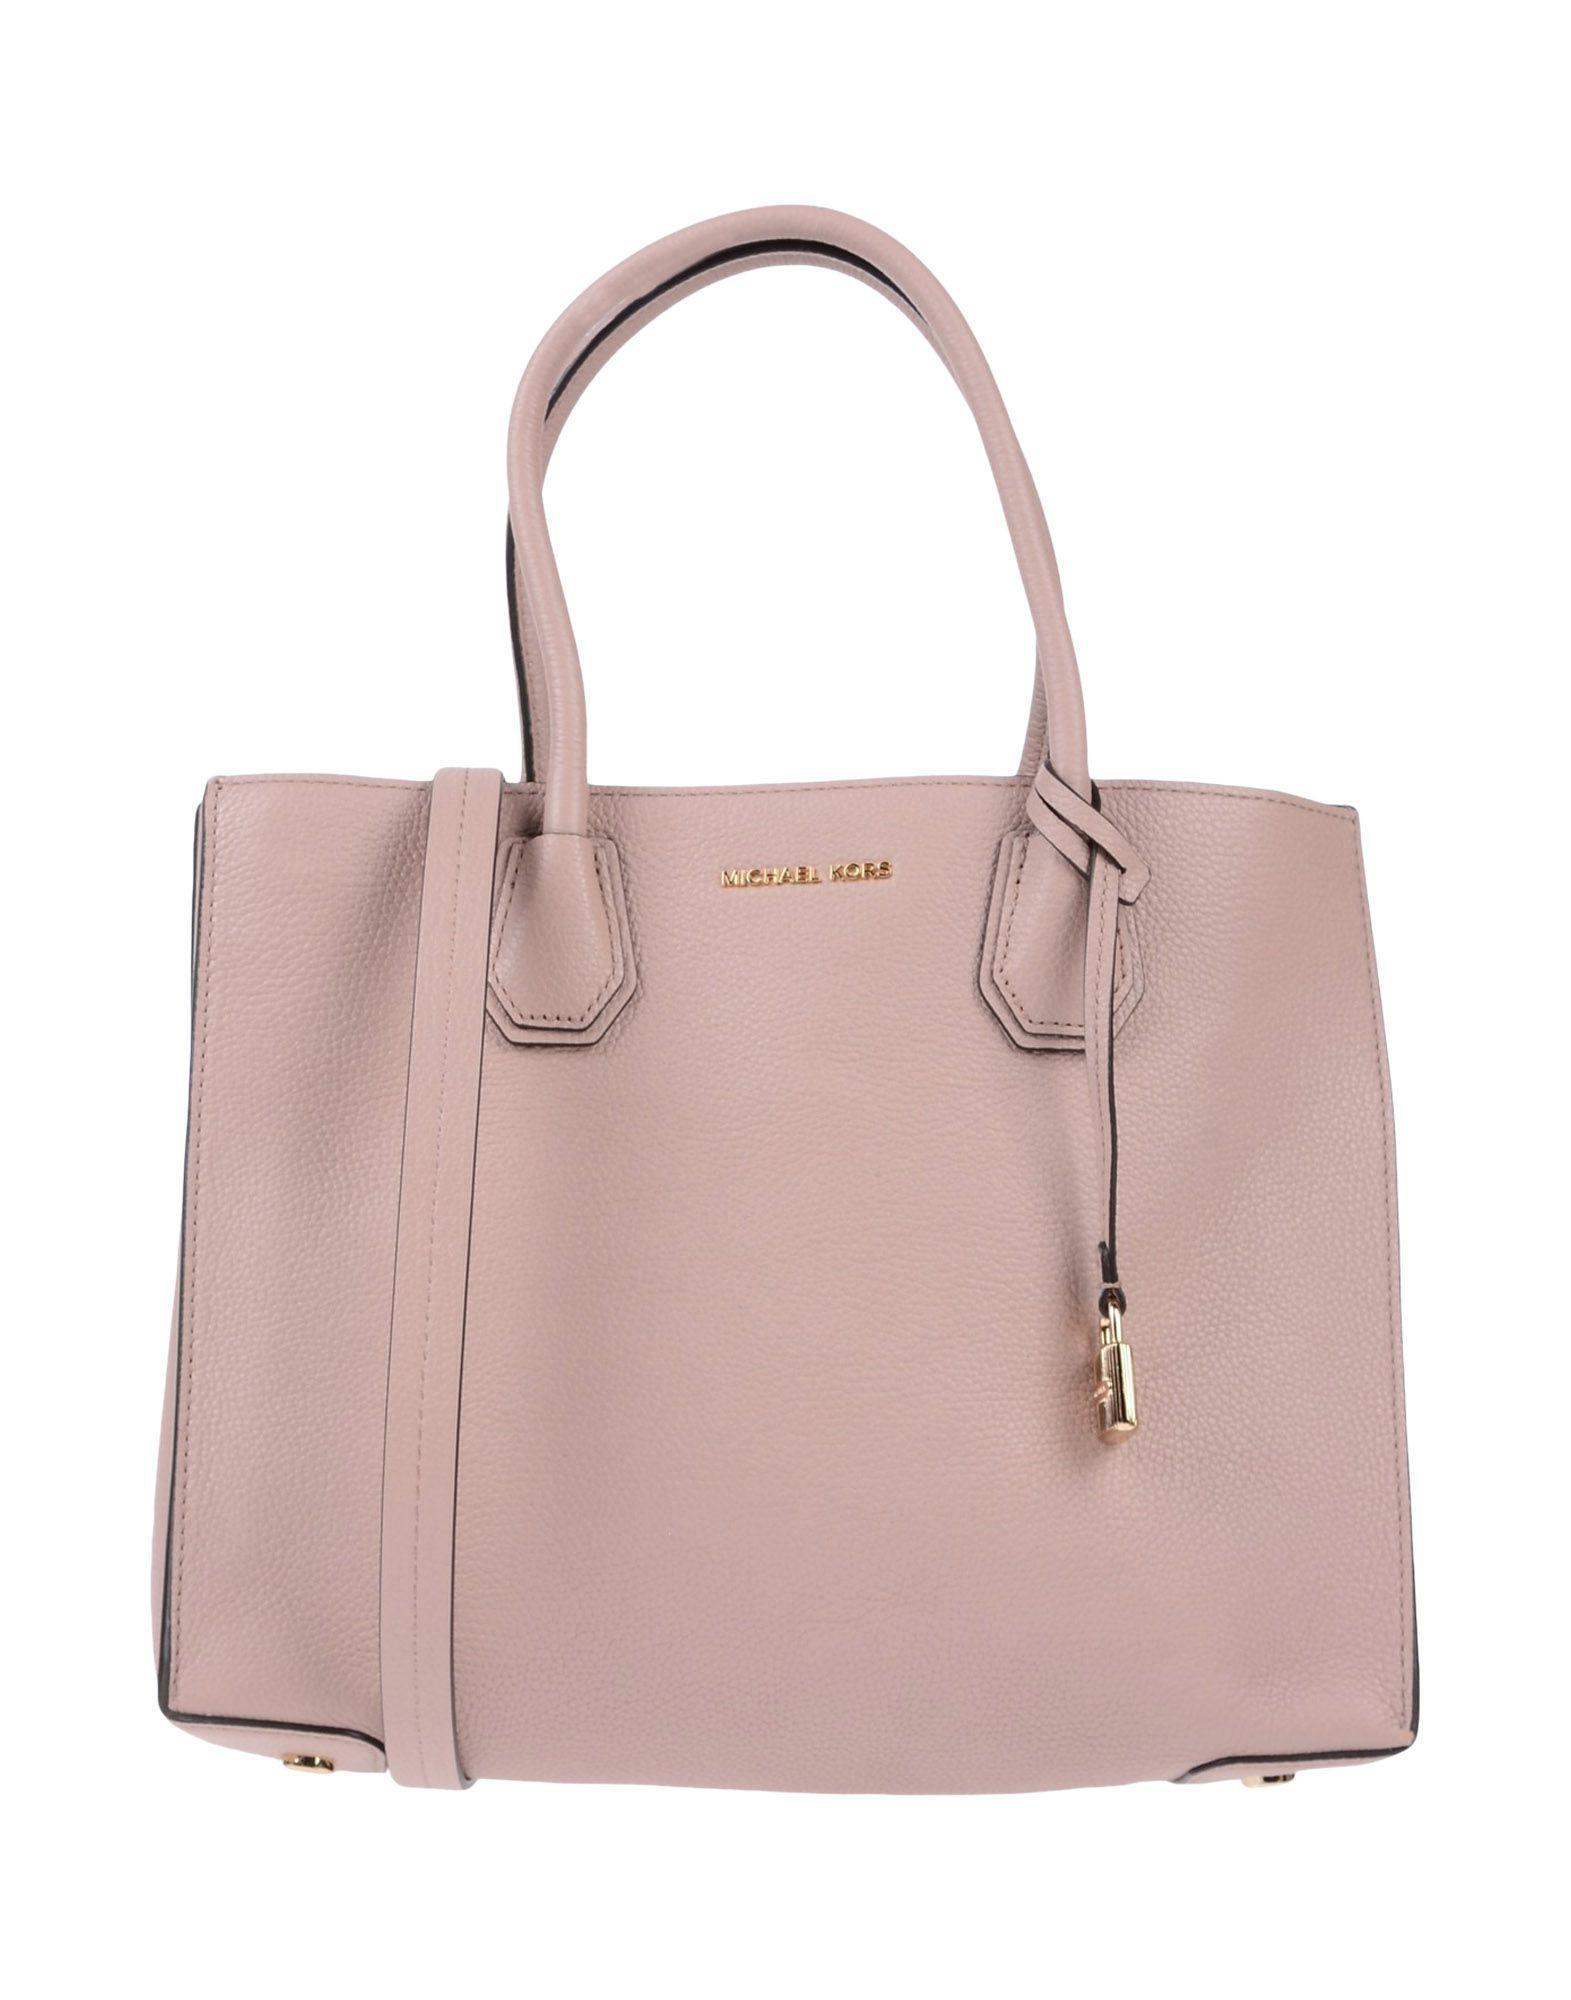 135b7d3f300e56 Michael Michael Kors Handbag in Pink - Lyst